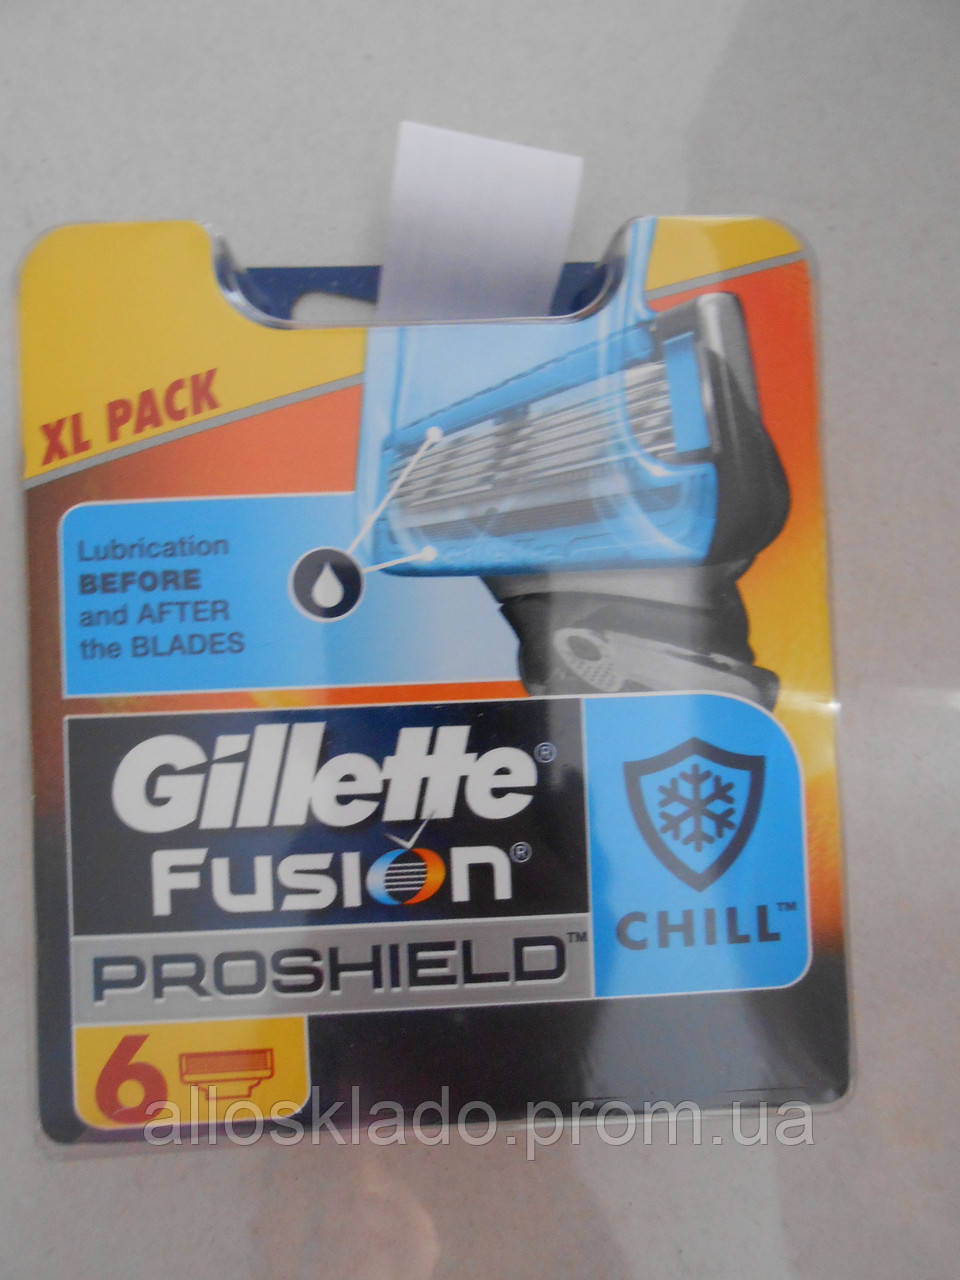 Сменные кассеты Gillette Fusion PROSHIELD 6 шт